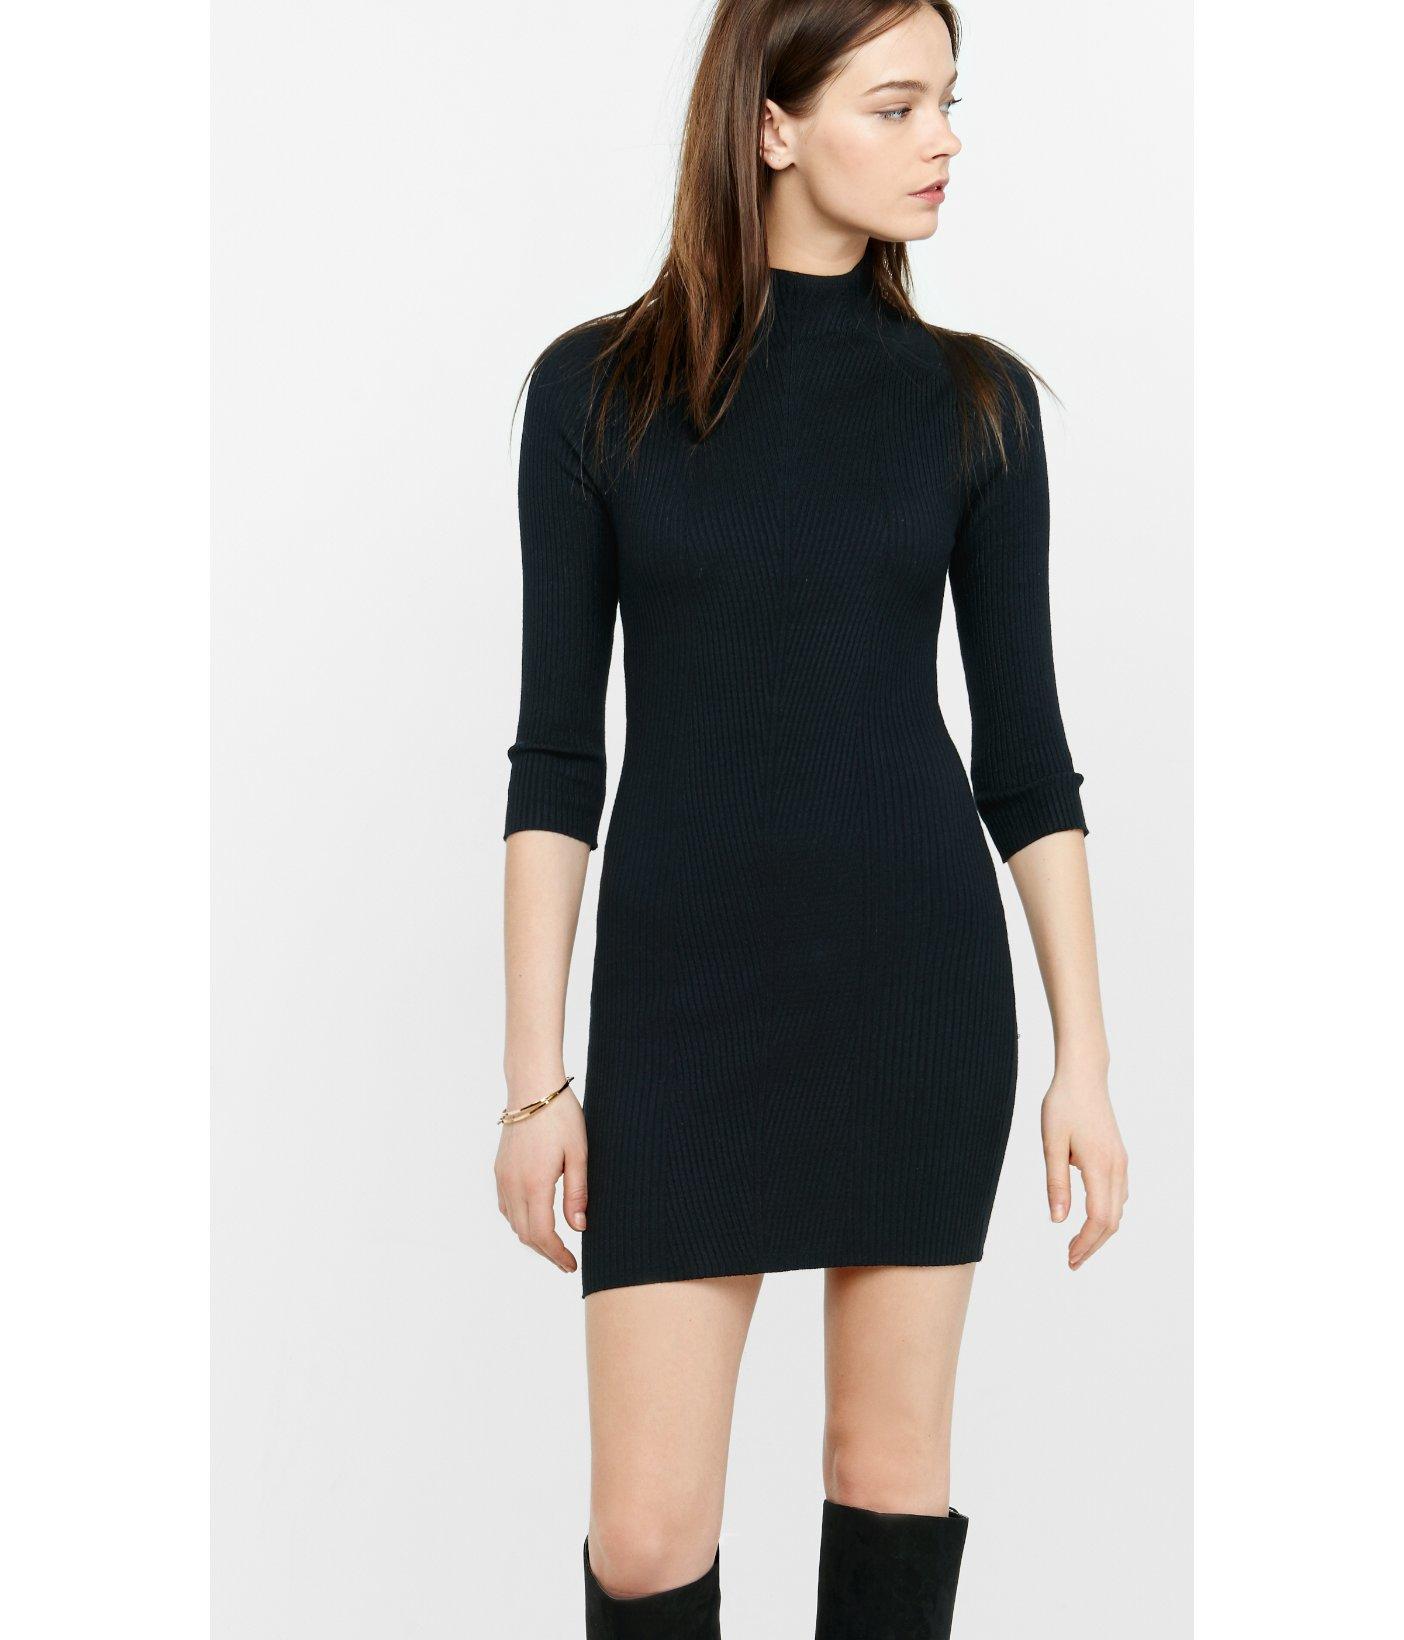 248453642cf Lyst - Express Mock Neck Engineered Rib Sweater Dress in Black